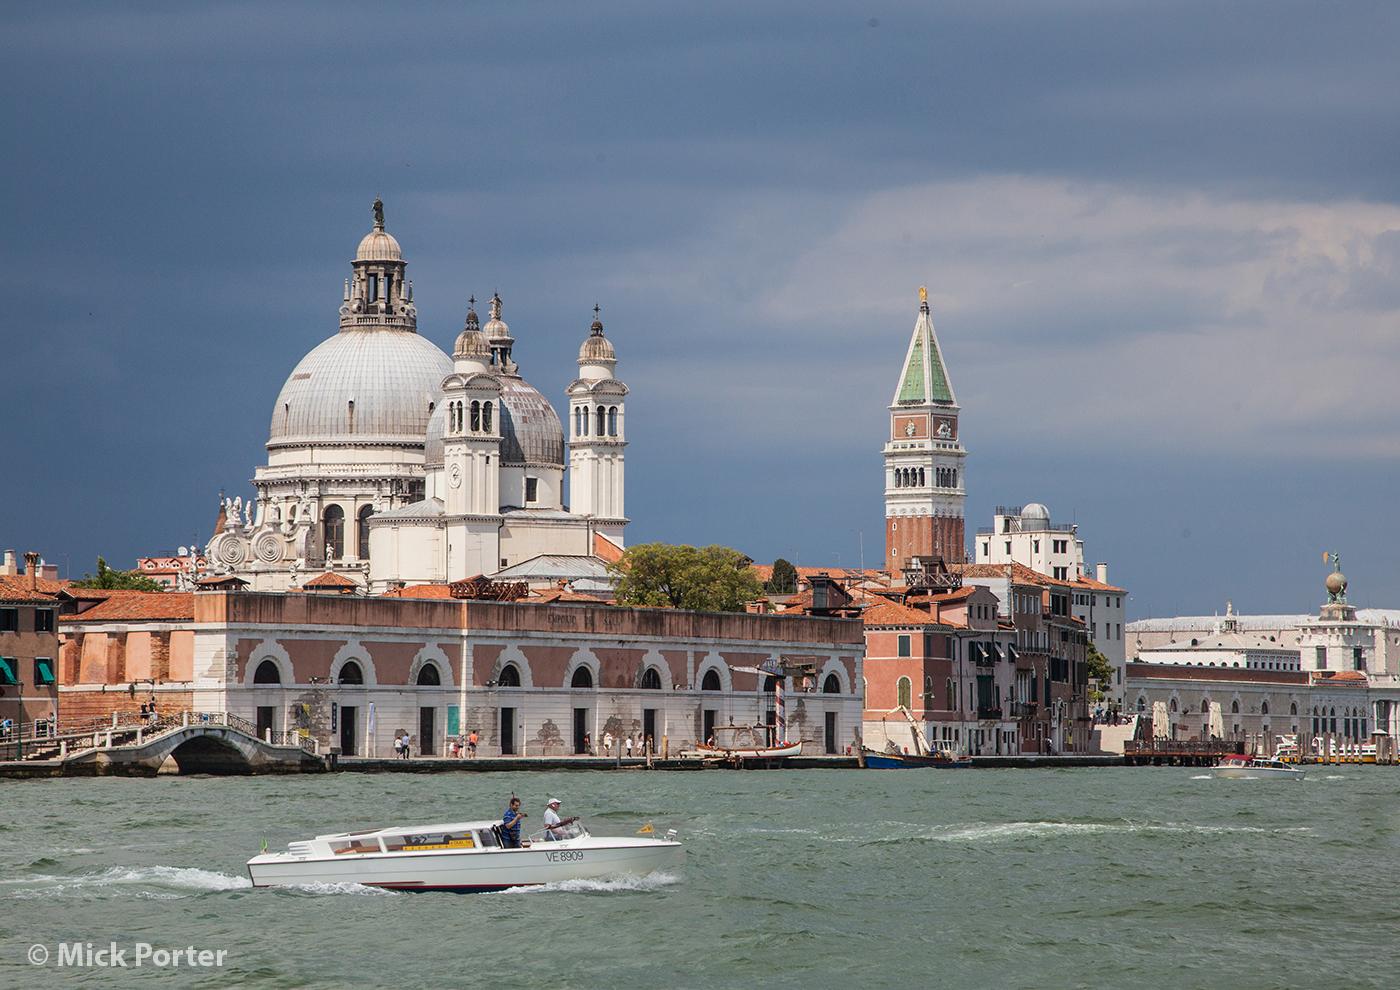 Storm Over Venice